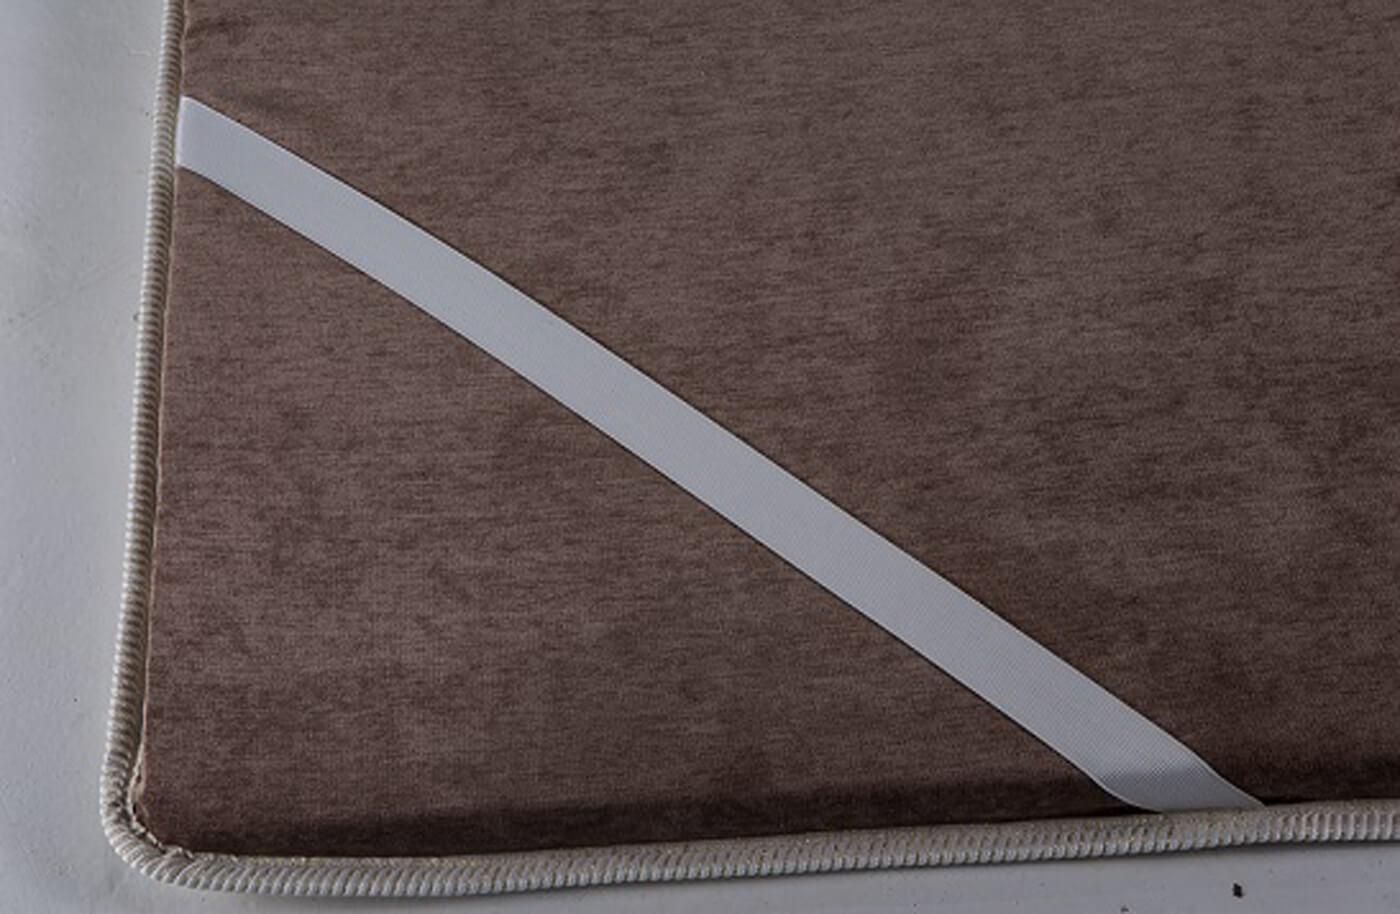 Manta Magnética Colchonete Solteiro 0,88 X1,88x05cm Kenko Premium   - Kenko Premium Colchões